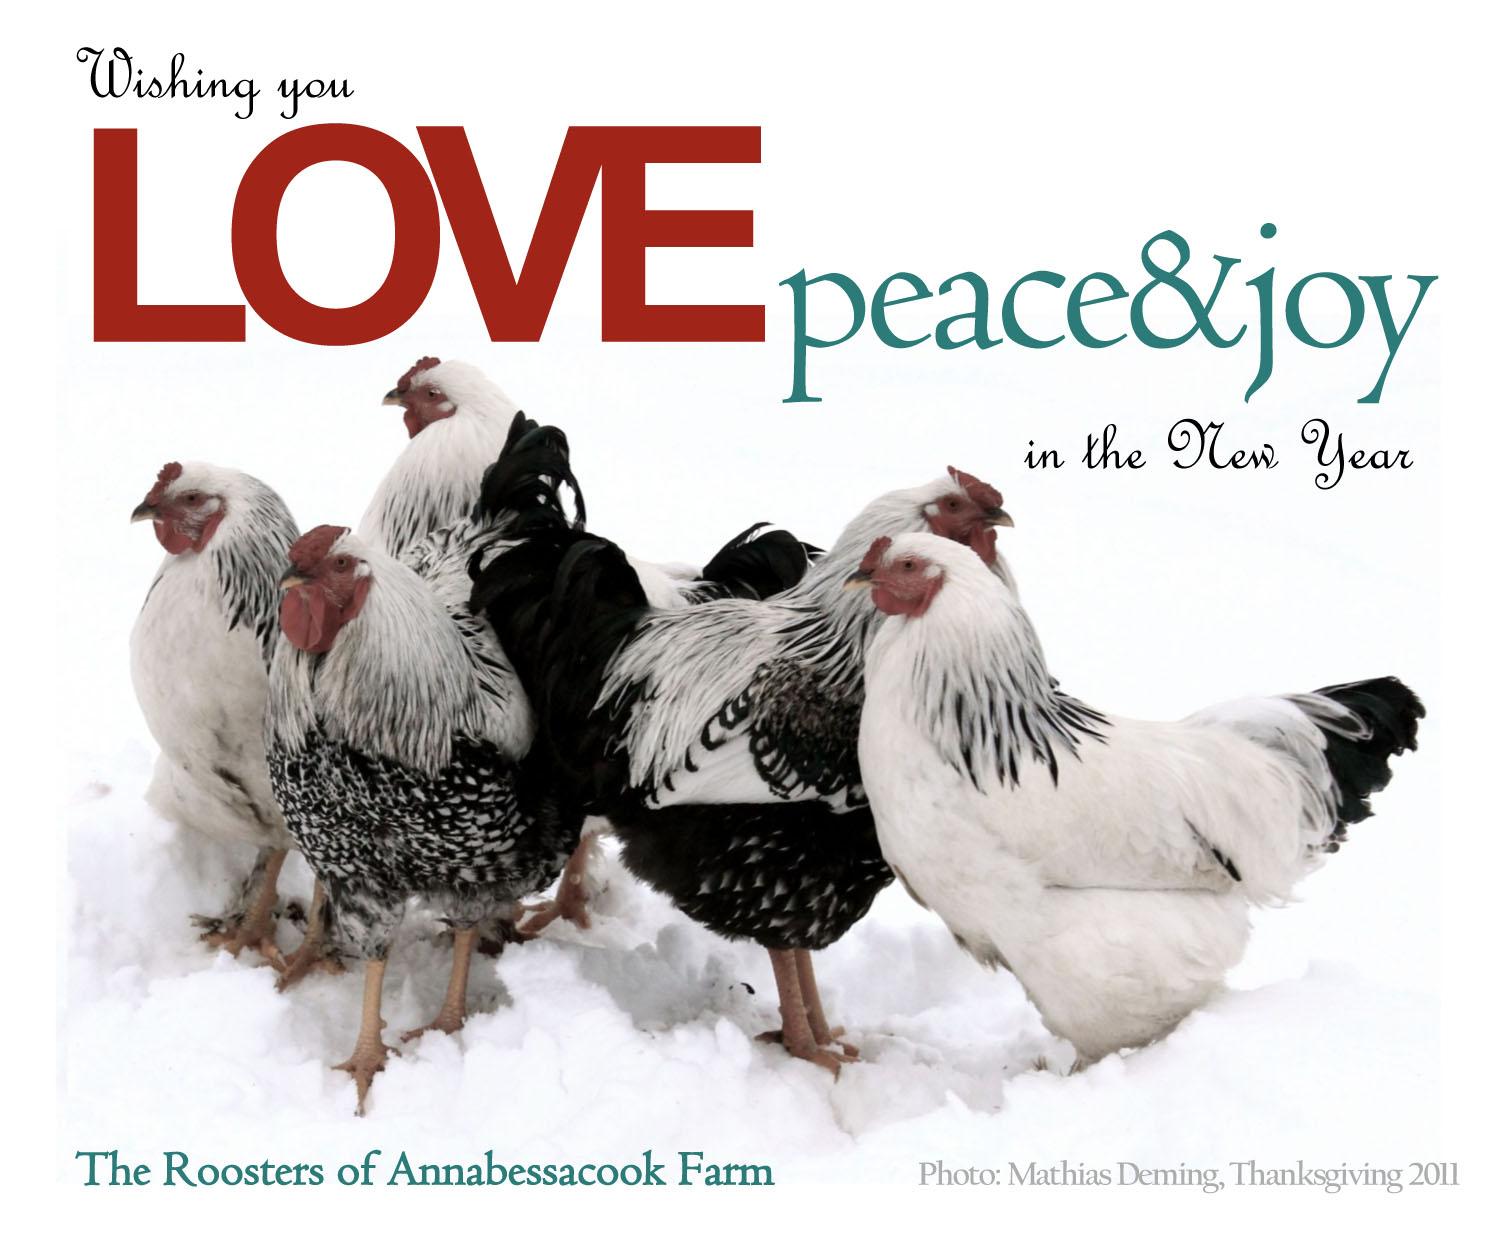 http://3.bp.blogspot.com/-kDKr5yi1KpA/TwB9mx9RqeI/AAAAAAAAJEU/2v8R67KwJAE/s1600/Christmas%2BPostcard1.jpg